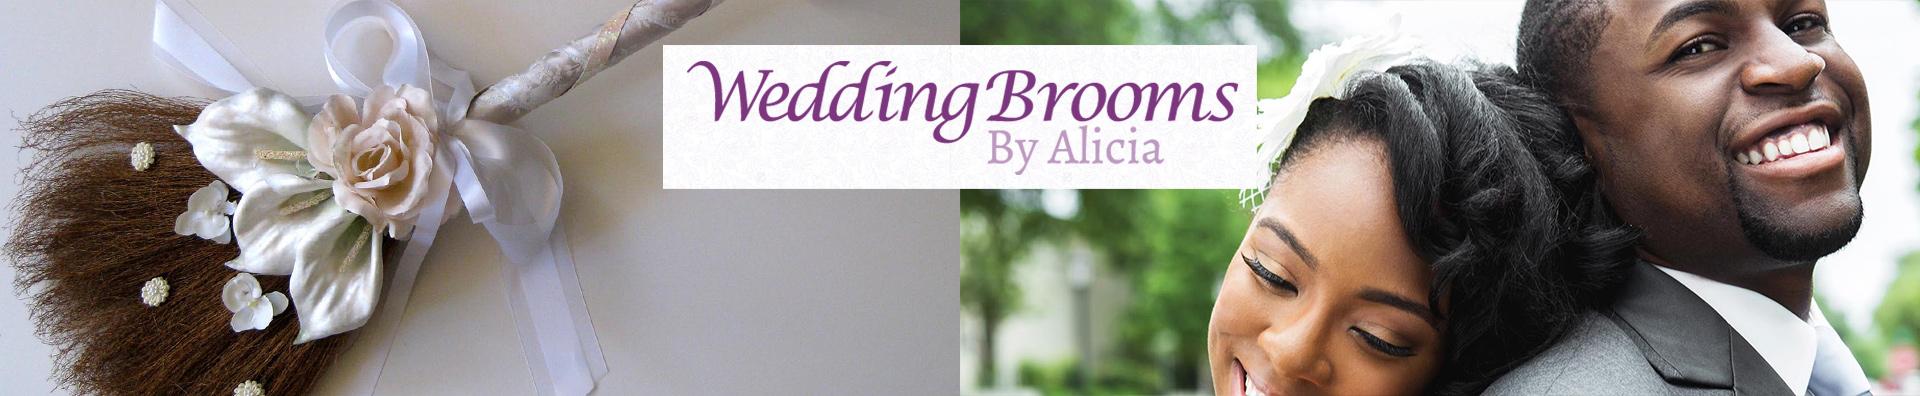 Wedding Brooms